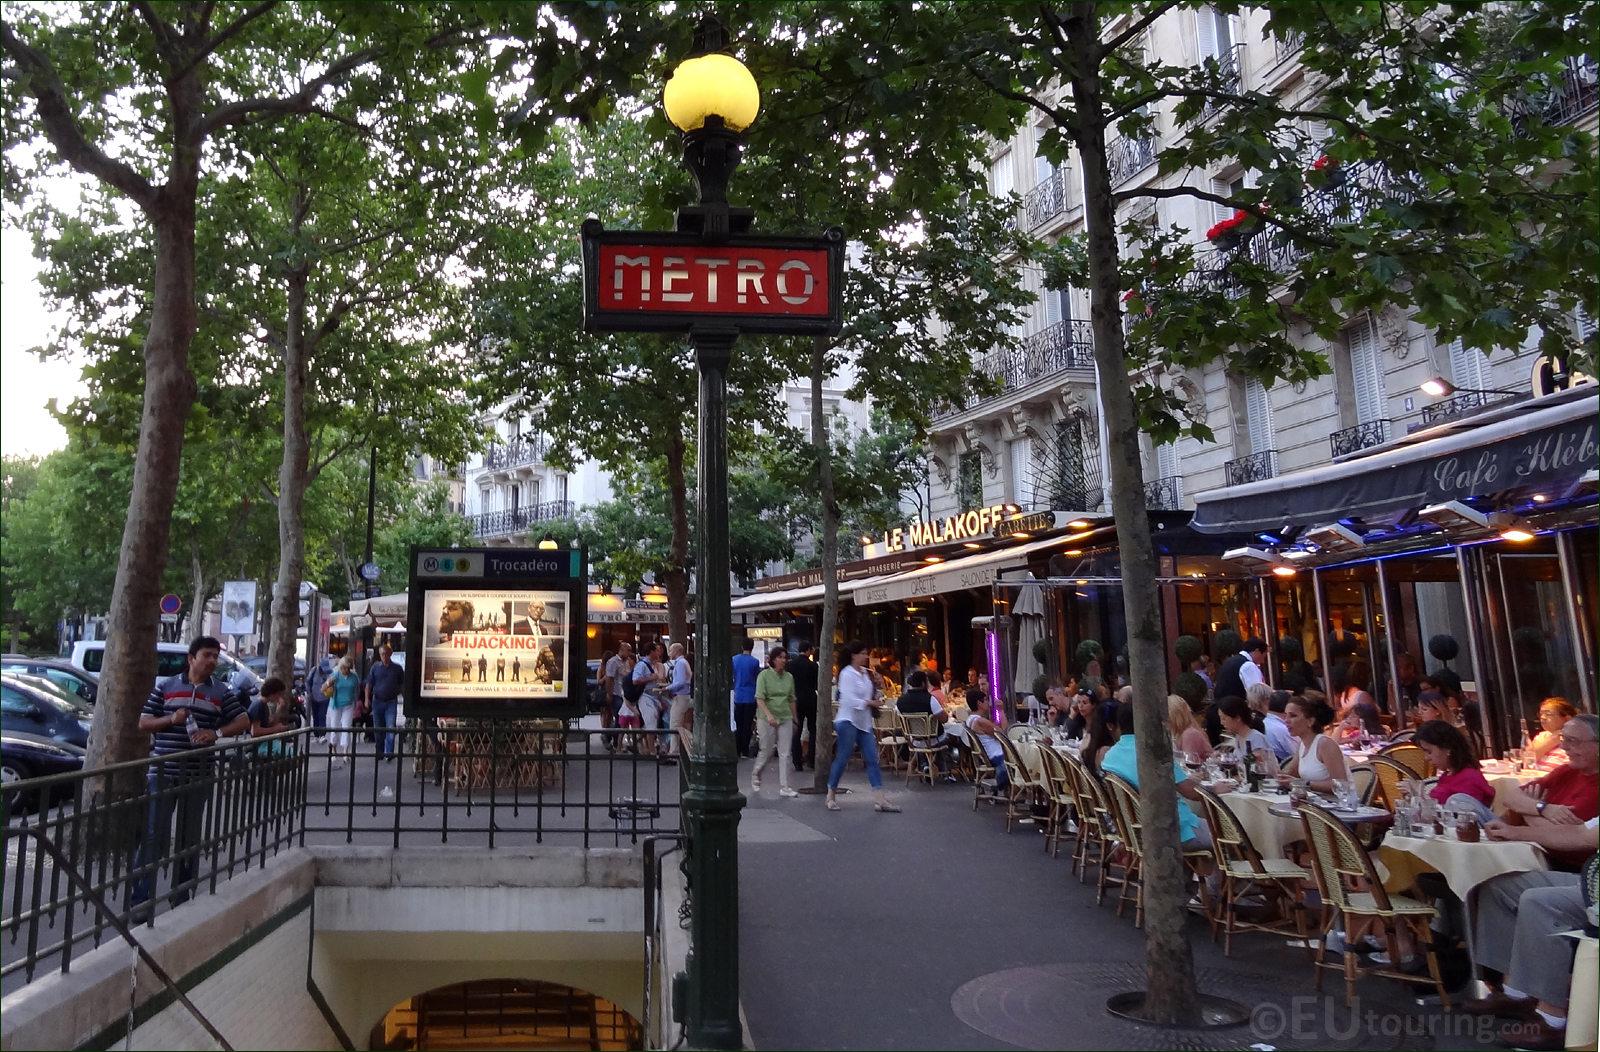 HD Photos Of The Paris Metro System - Page 1